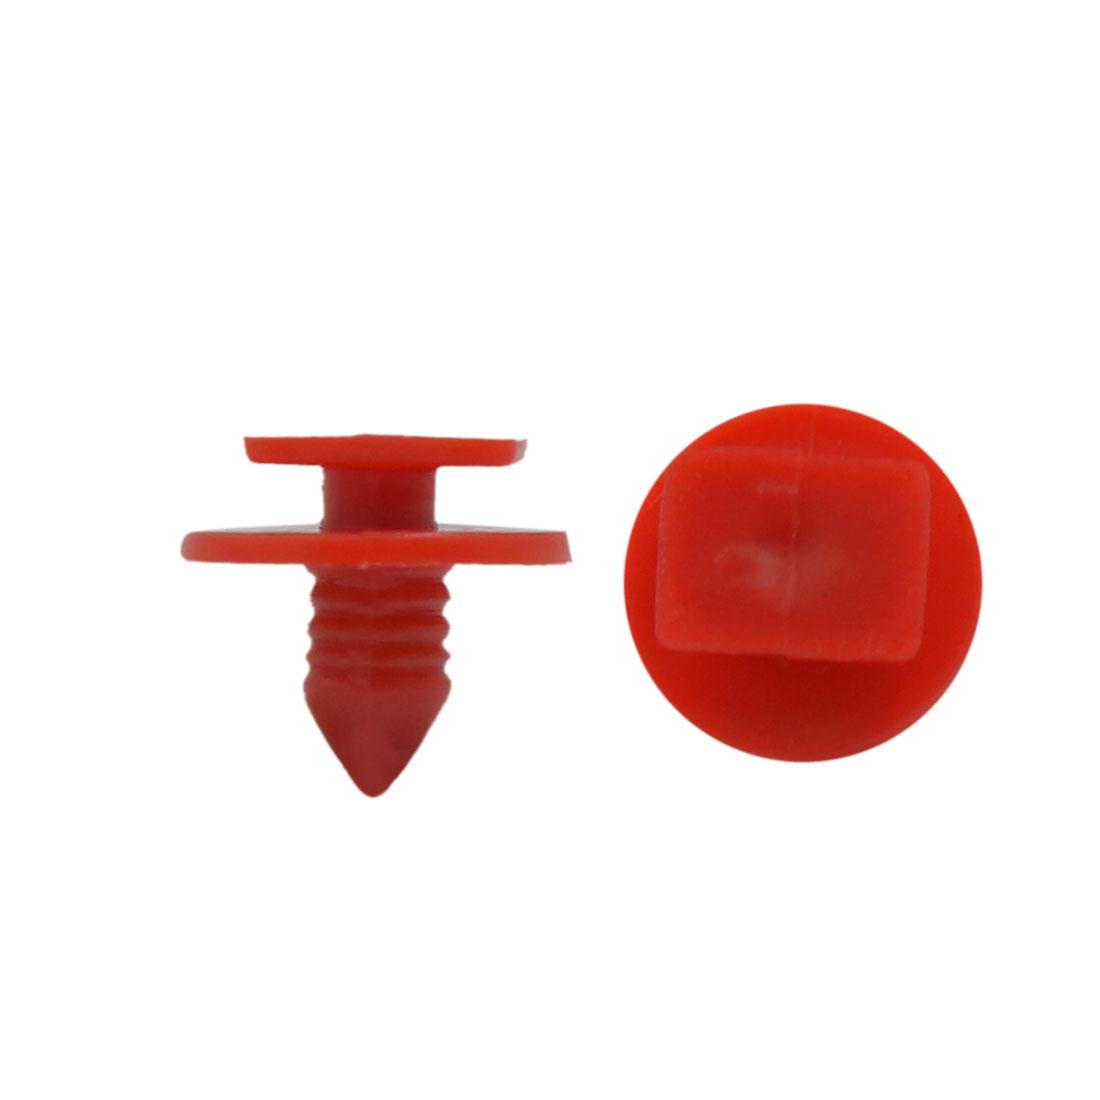 100 Pcs Red 6mm Dia Hole Plastic Push-Type Bumper Retainer Rivet Clips for Car